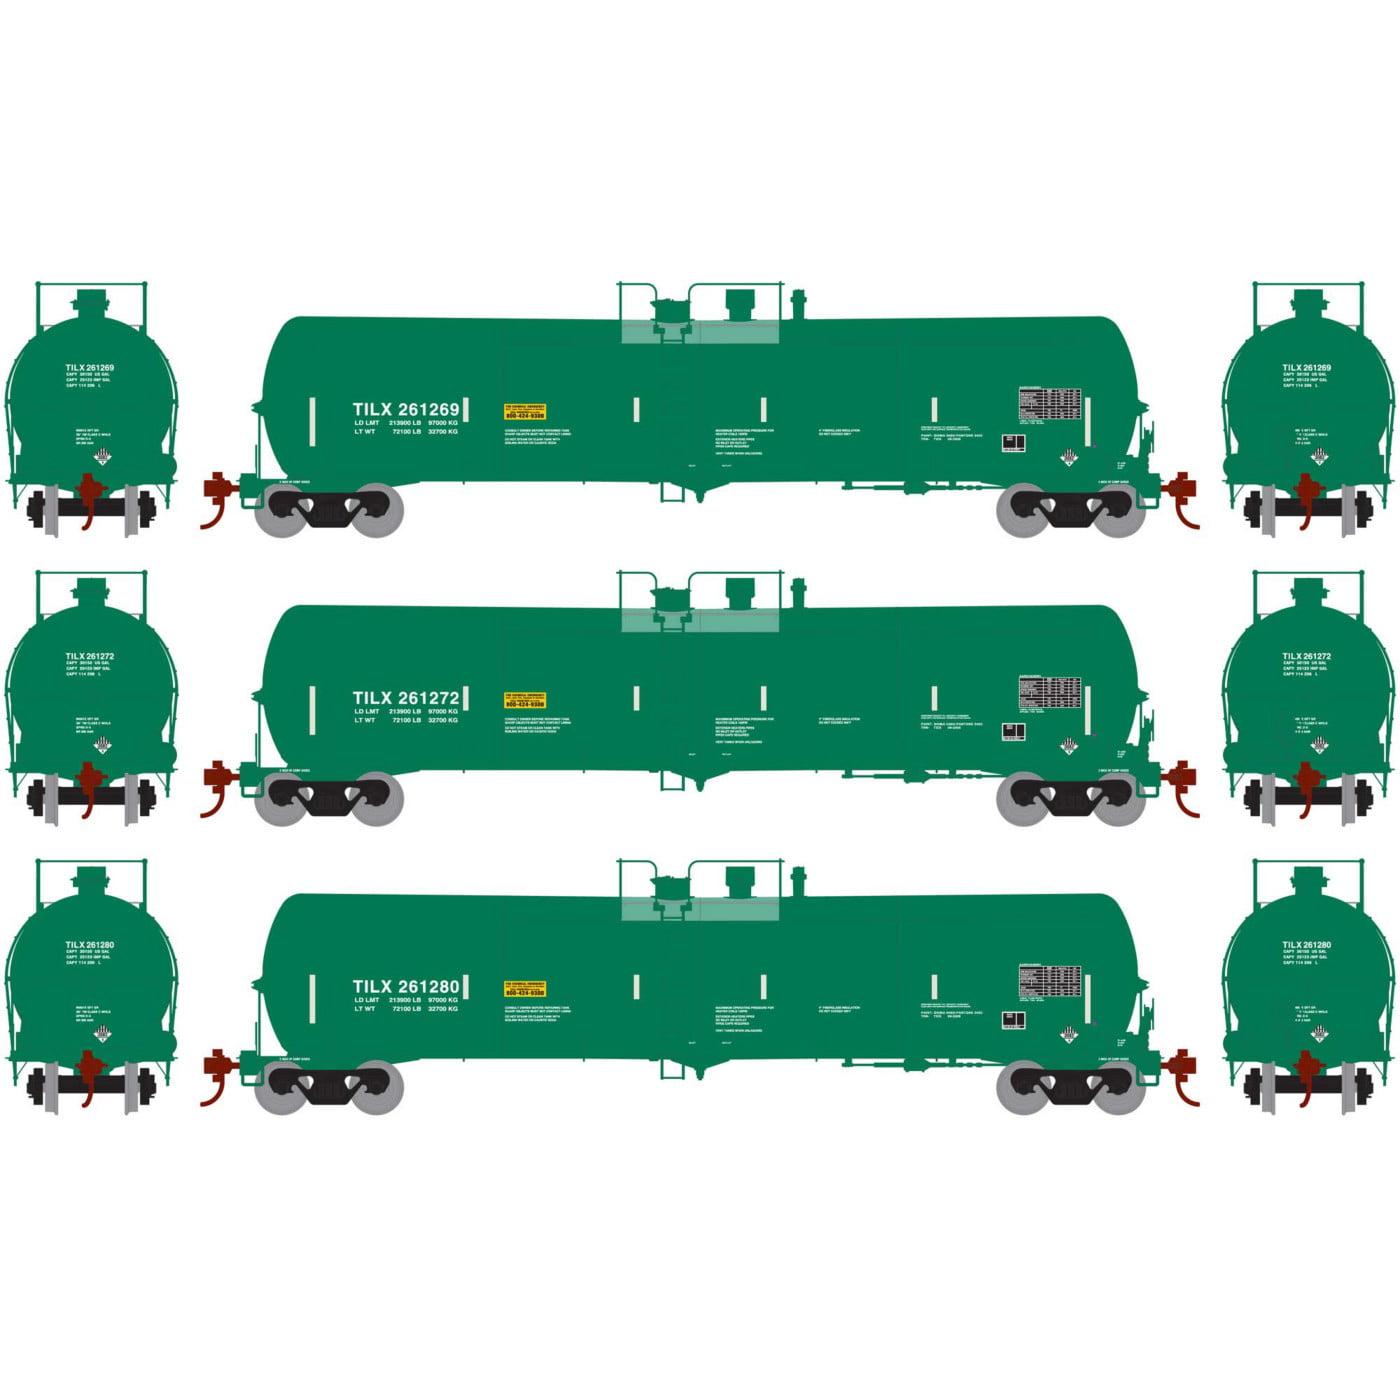 Athearn HO RTR 30,000 Gal Ethanol Tank TILX Green #3 (3), ATH28258